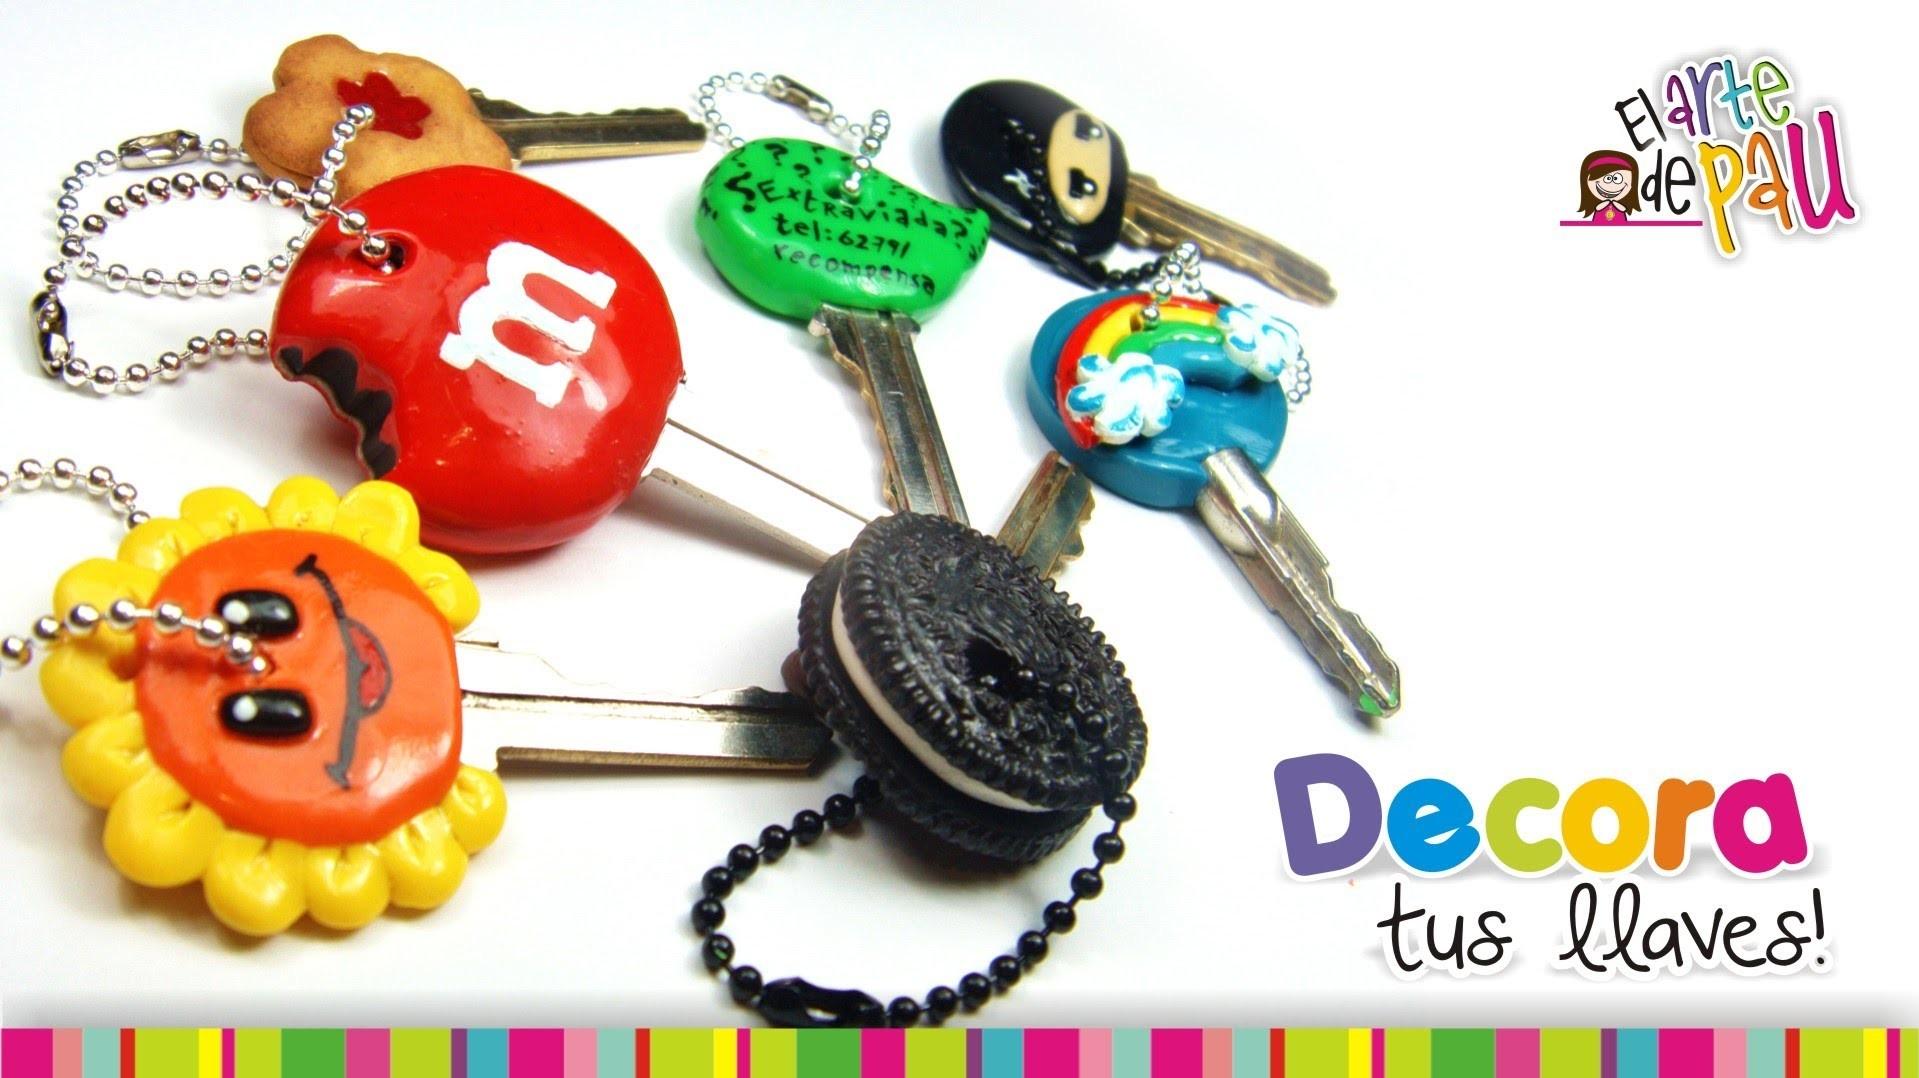 Decorate your keys with Polymer clay. Decora tus llaves con Arcilla Polimérica